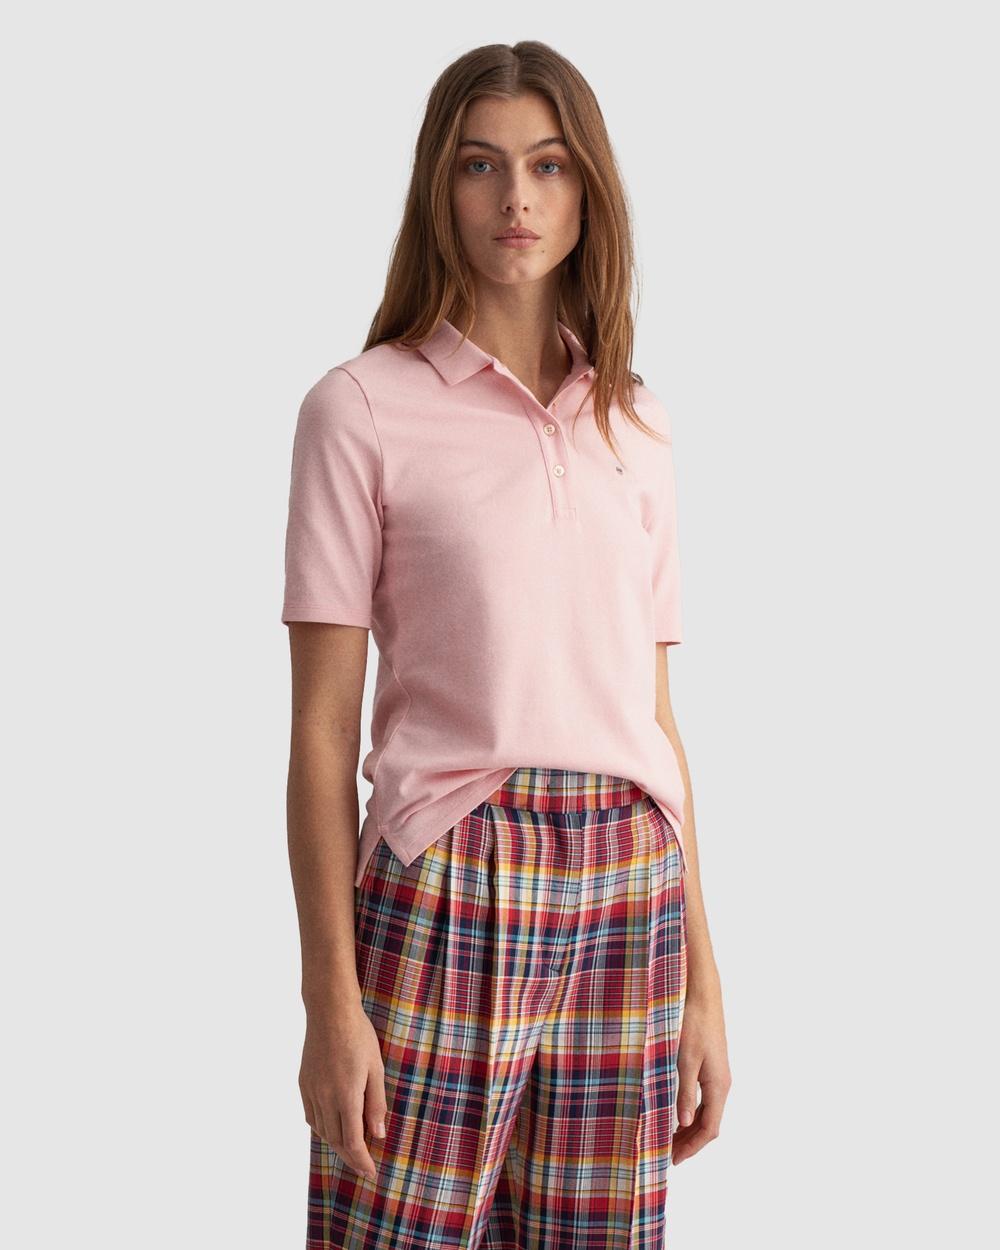 Gant Original Long Short Sleeve Piqué Polo Shirt Shirts & Polos PREPPY PINK Long-Short